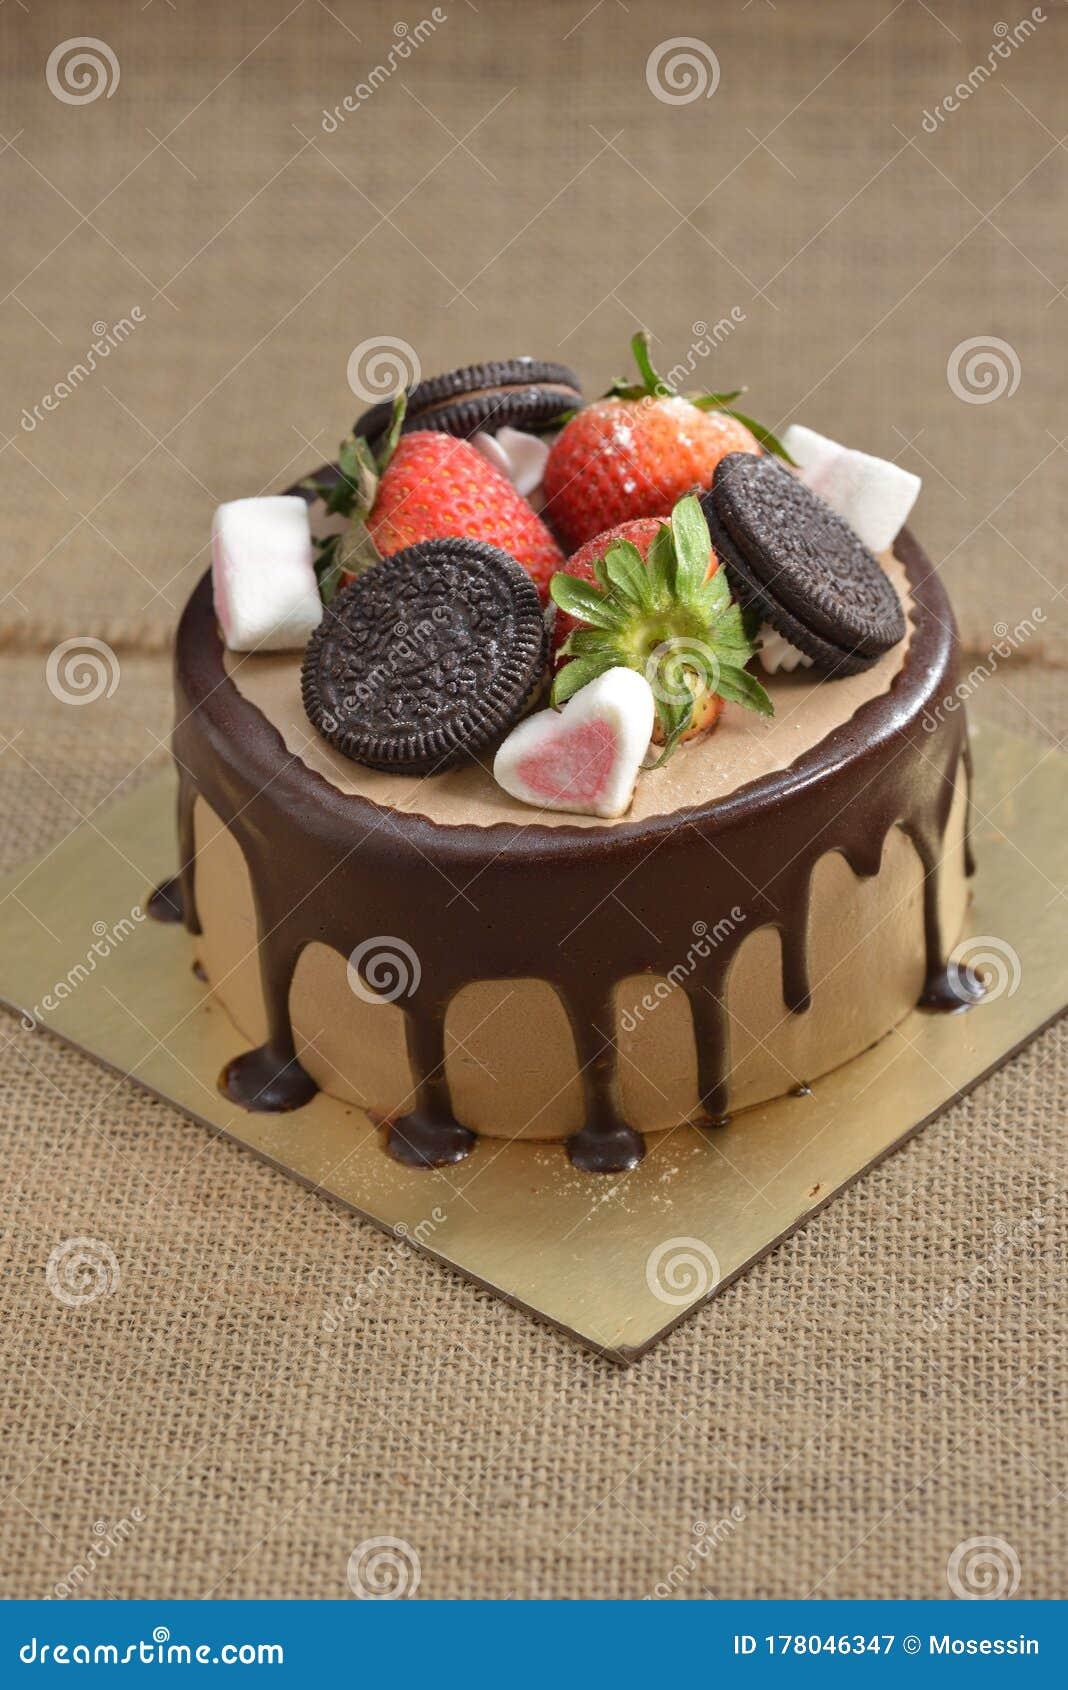 Stupendous Chocolate Strawberry Birthday Cake Strawberry Stock Image Image Funny Birthday Cards Online Overcheapnameinfo